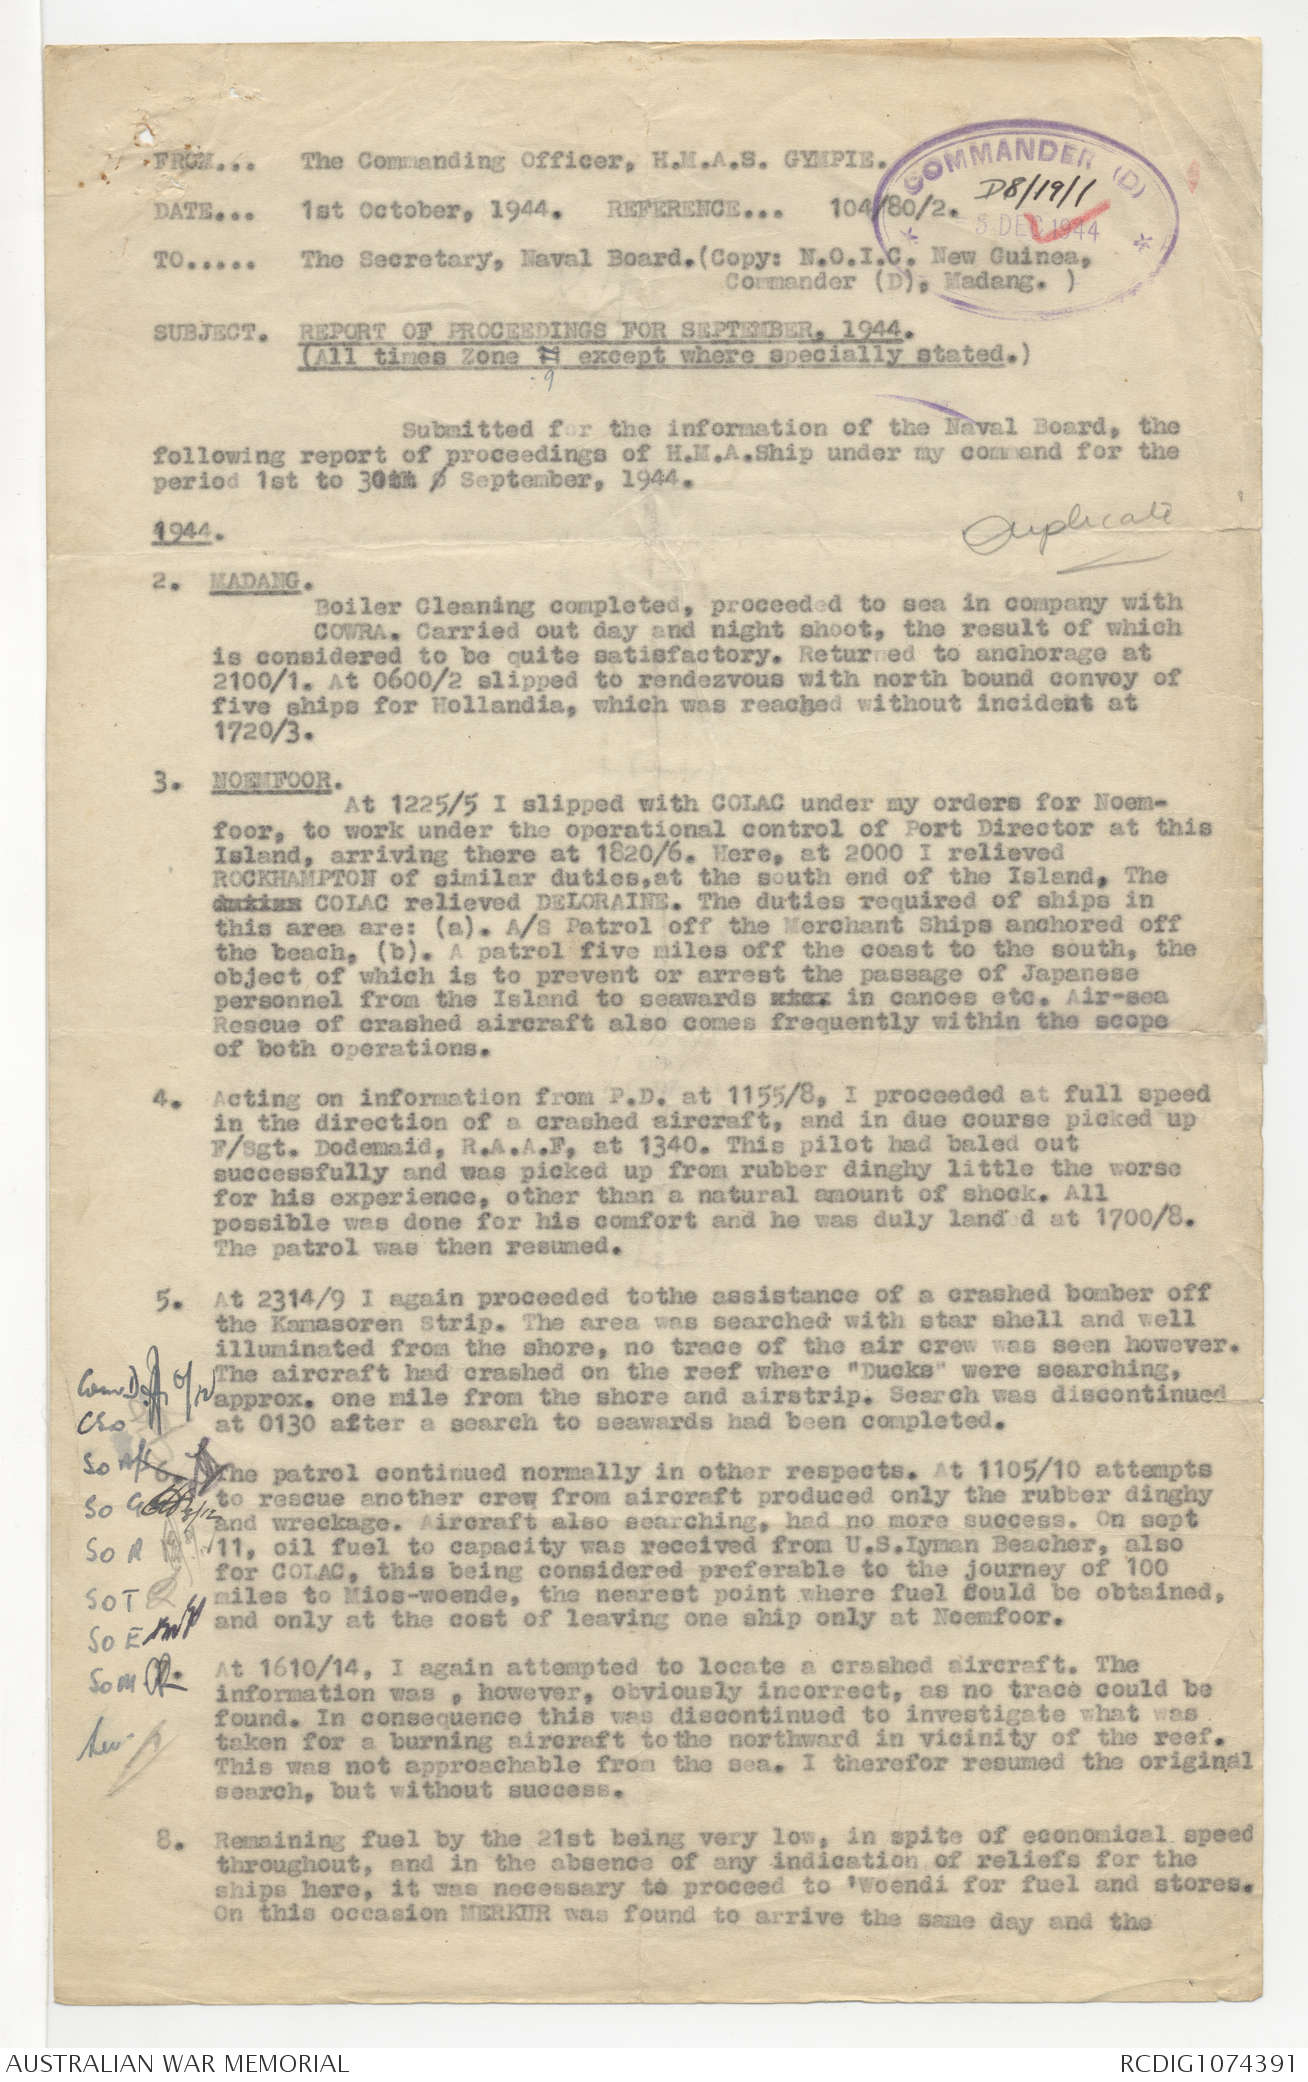 AWM78 127/2 - February 1943 - November 1945  Duplicate | The